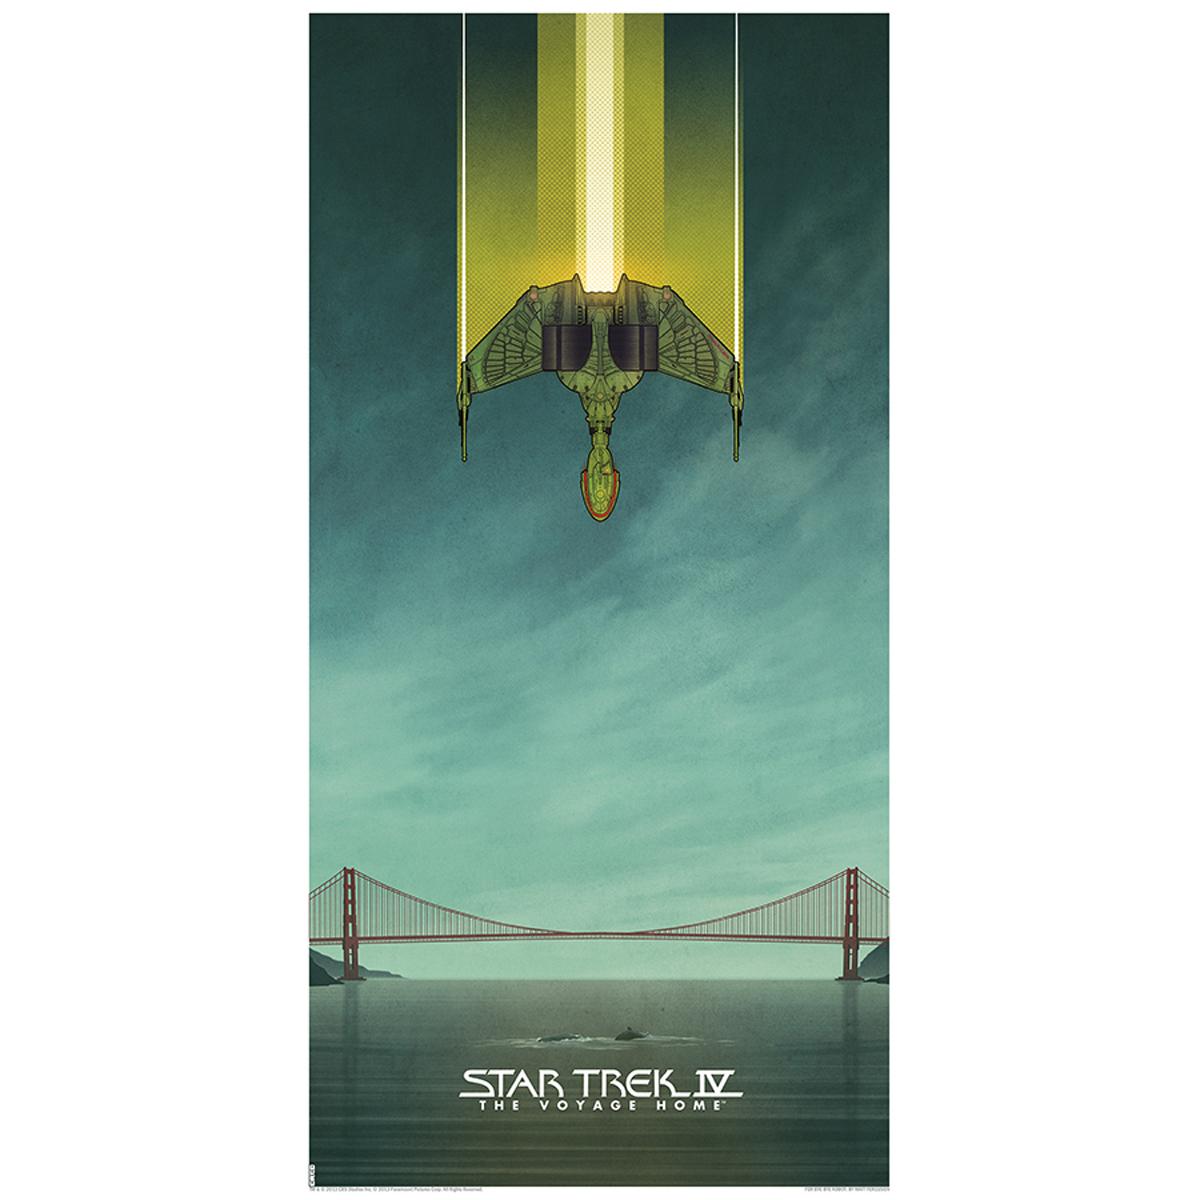 Star Trek IV: The Voyage Home Lithograph [12x24]